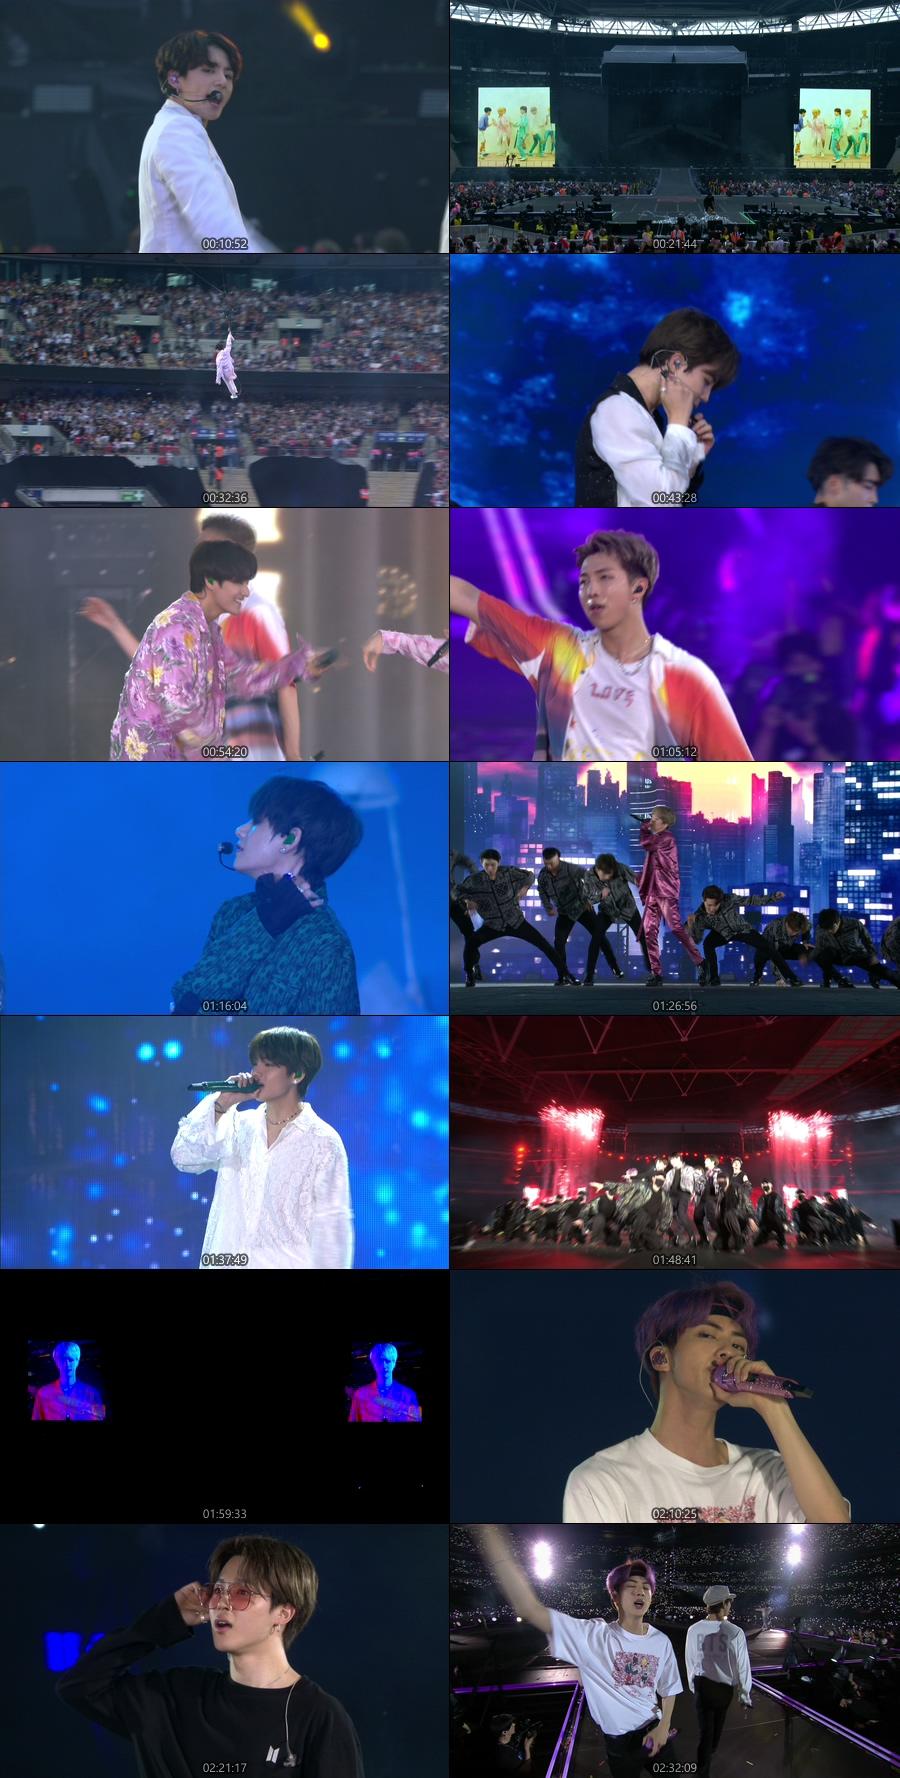 BTS - World Tour at Wembley Stadium (2)